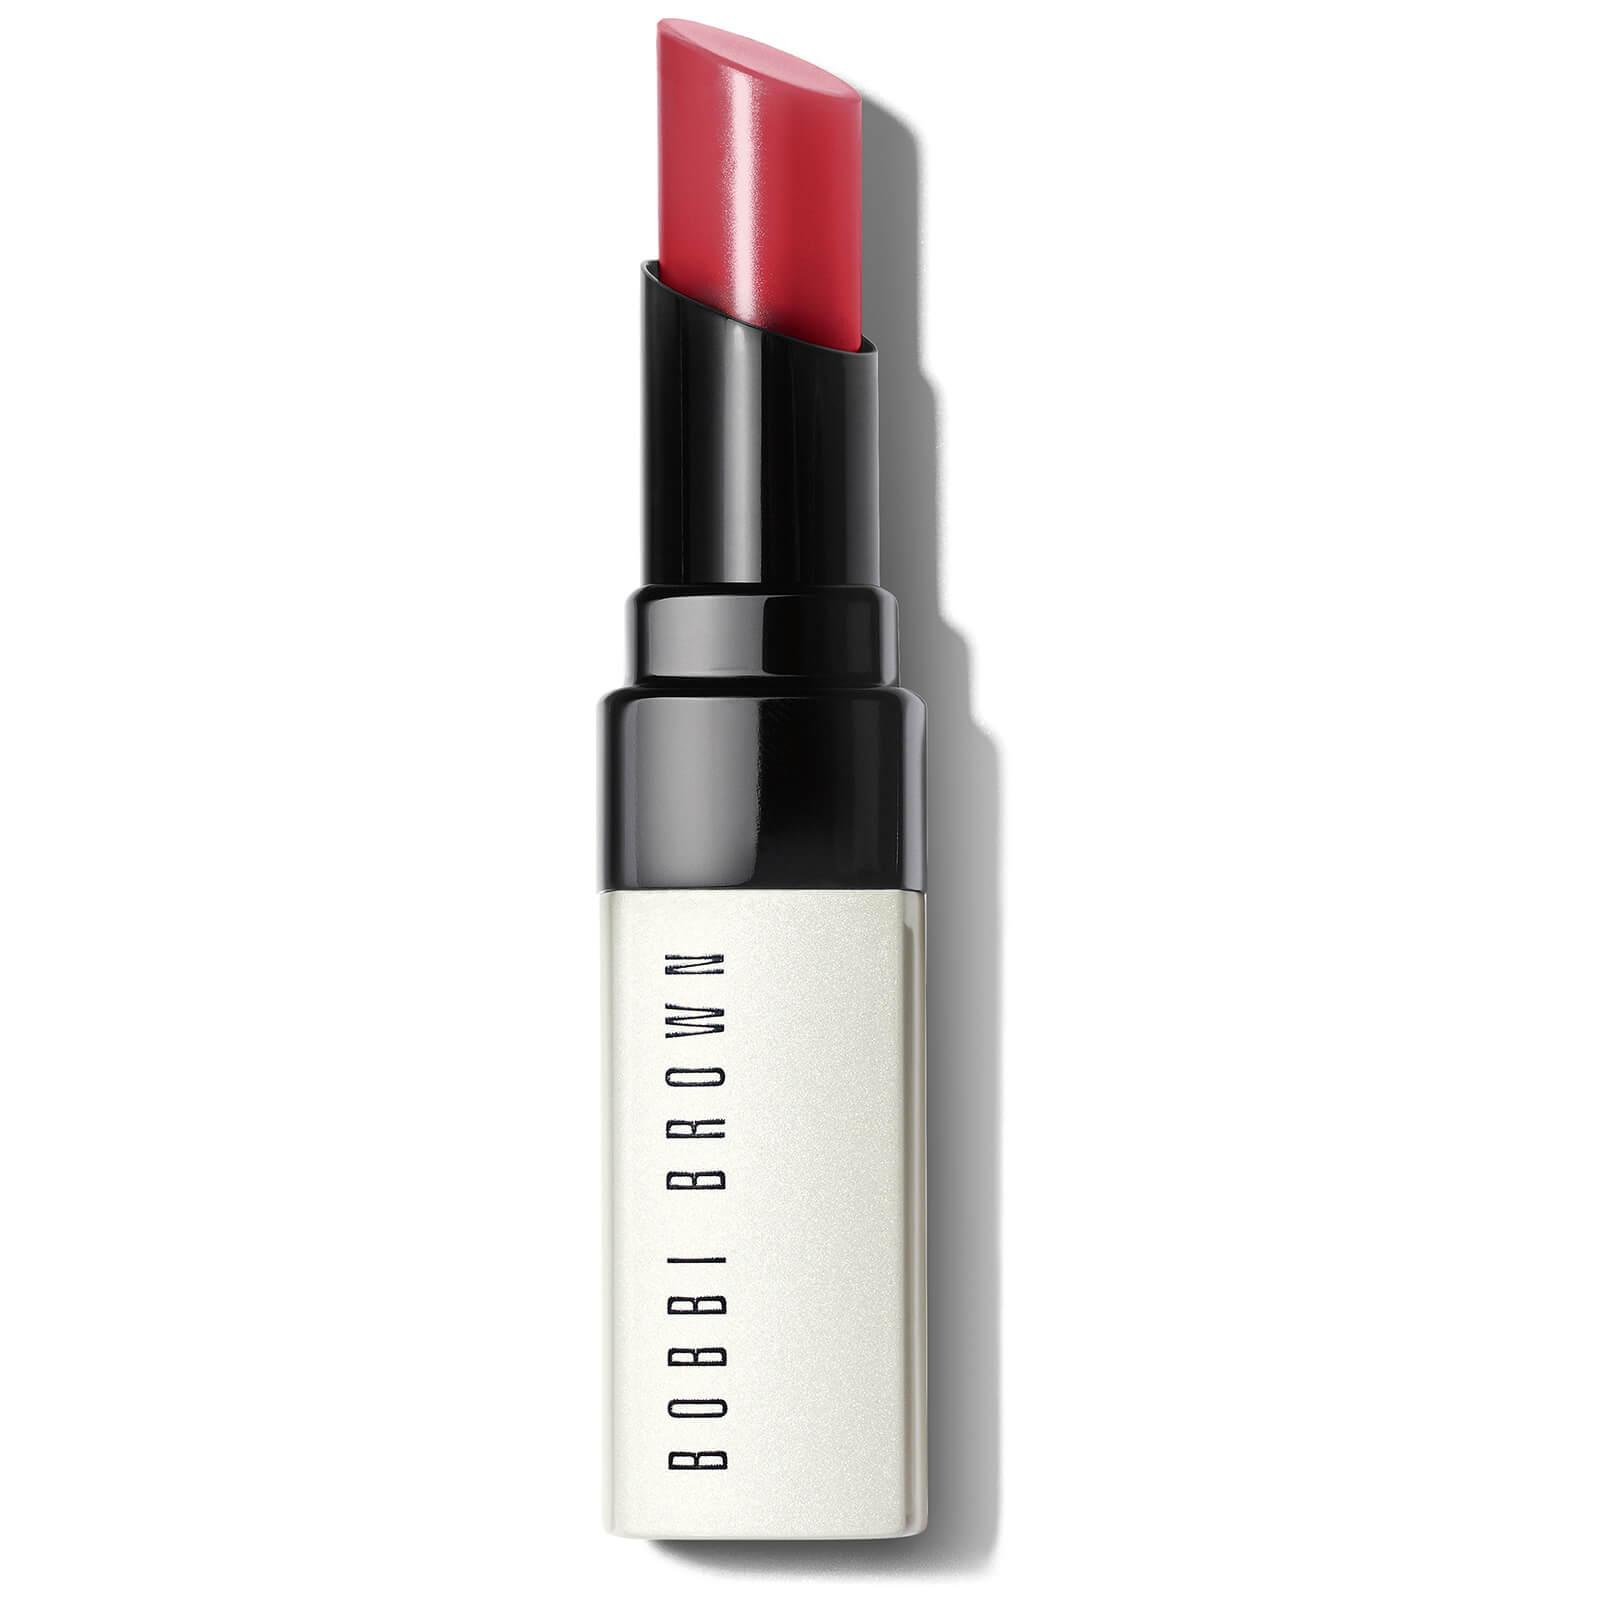 Bobbi Brown Extra Lip Tint 2.3g (Various Shades) - Bare Raspberry